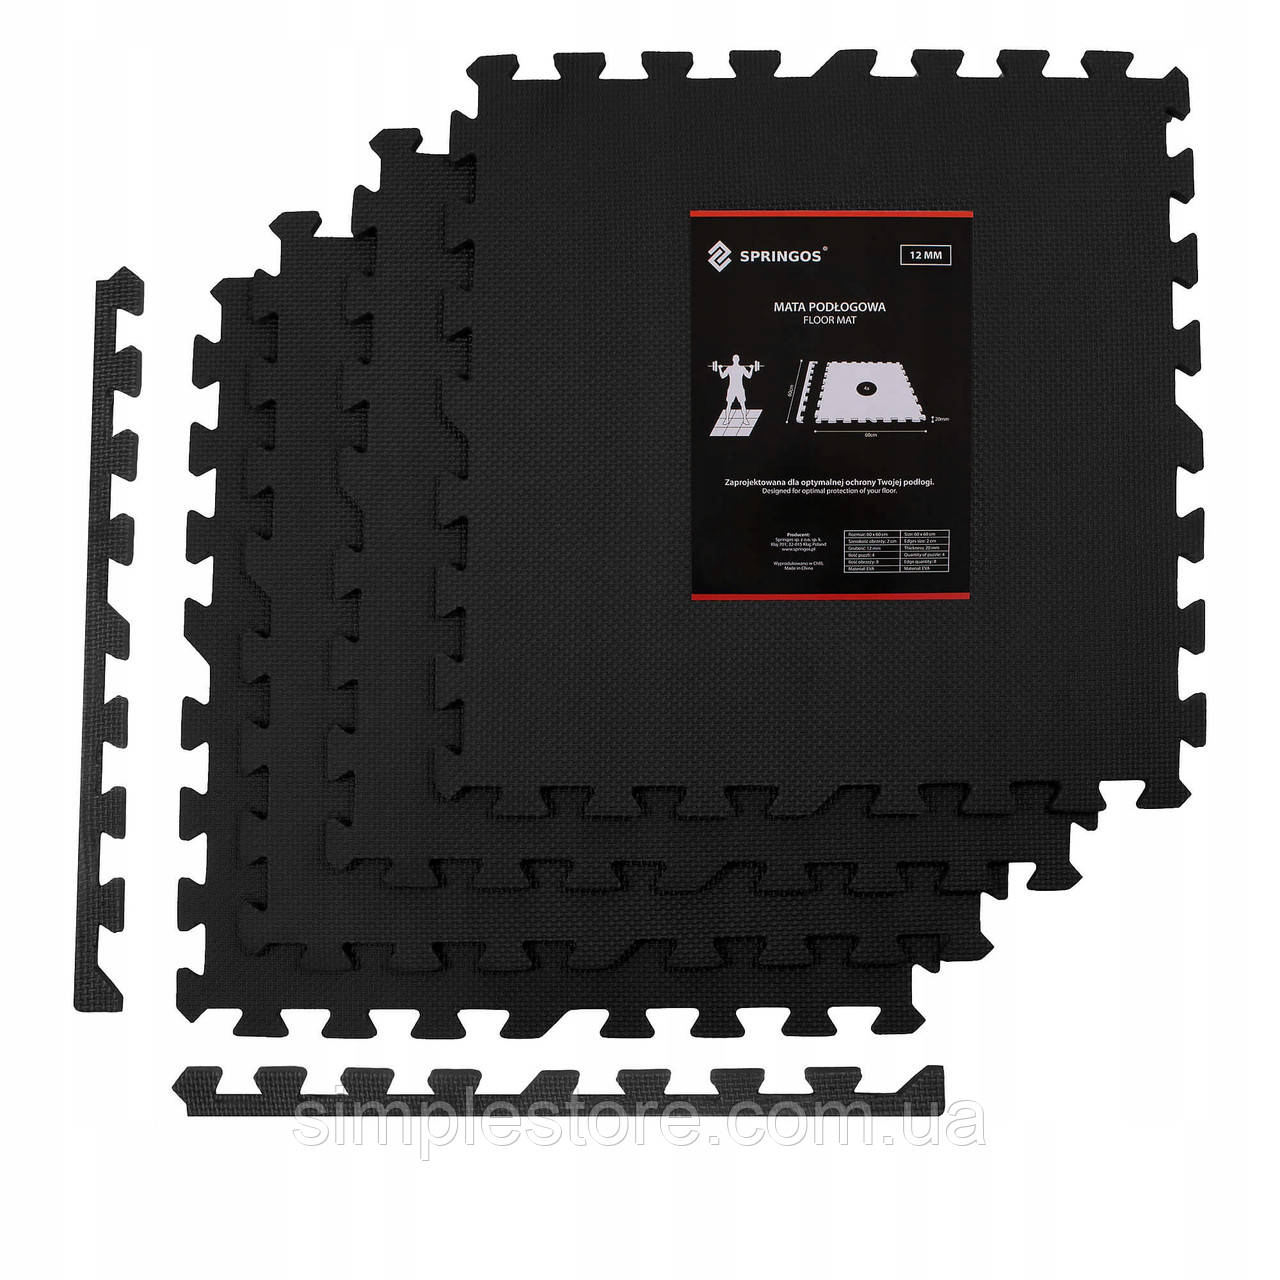 Мат-пазл (ласточкин хвост) Springos Mat Puzzle EVA 120 x 120 x 1.2 cм FM0002 Black. Мат-татами